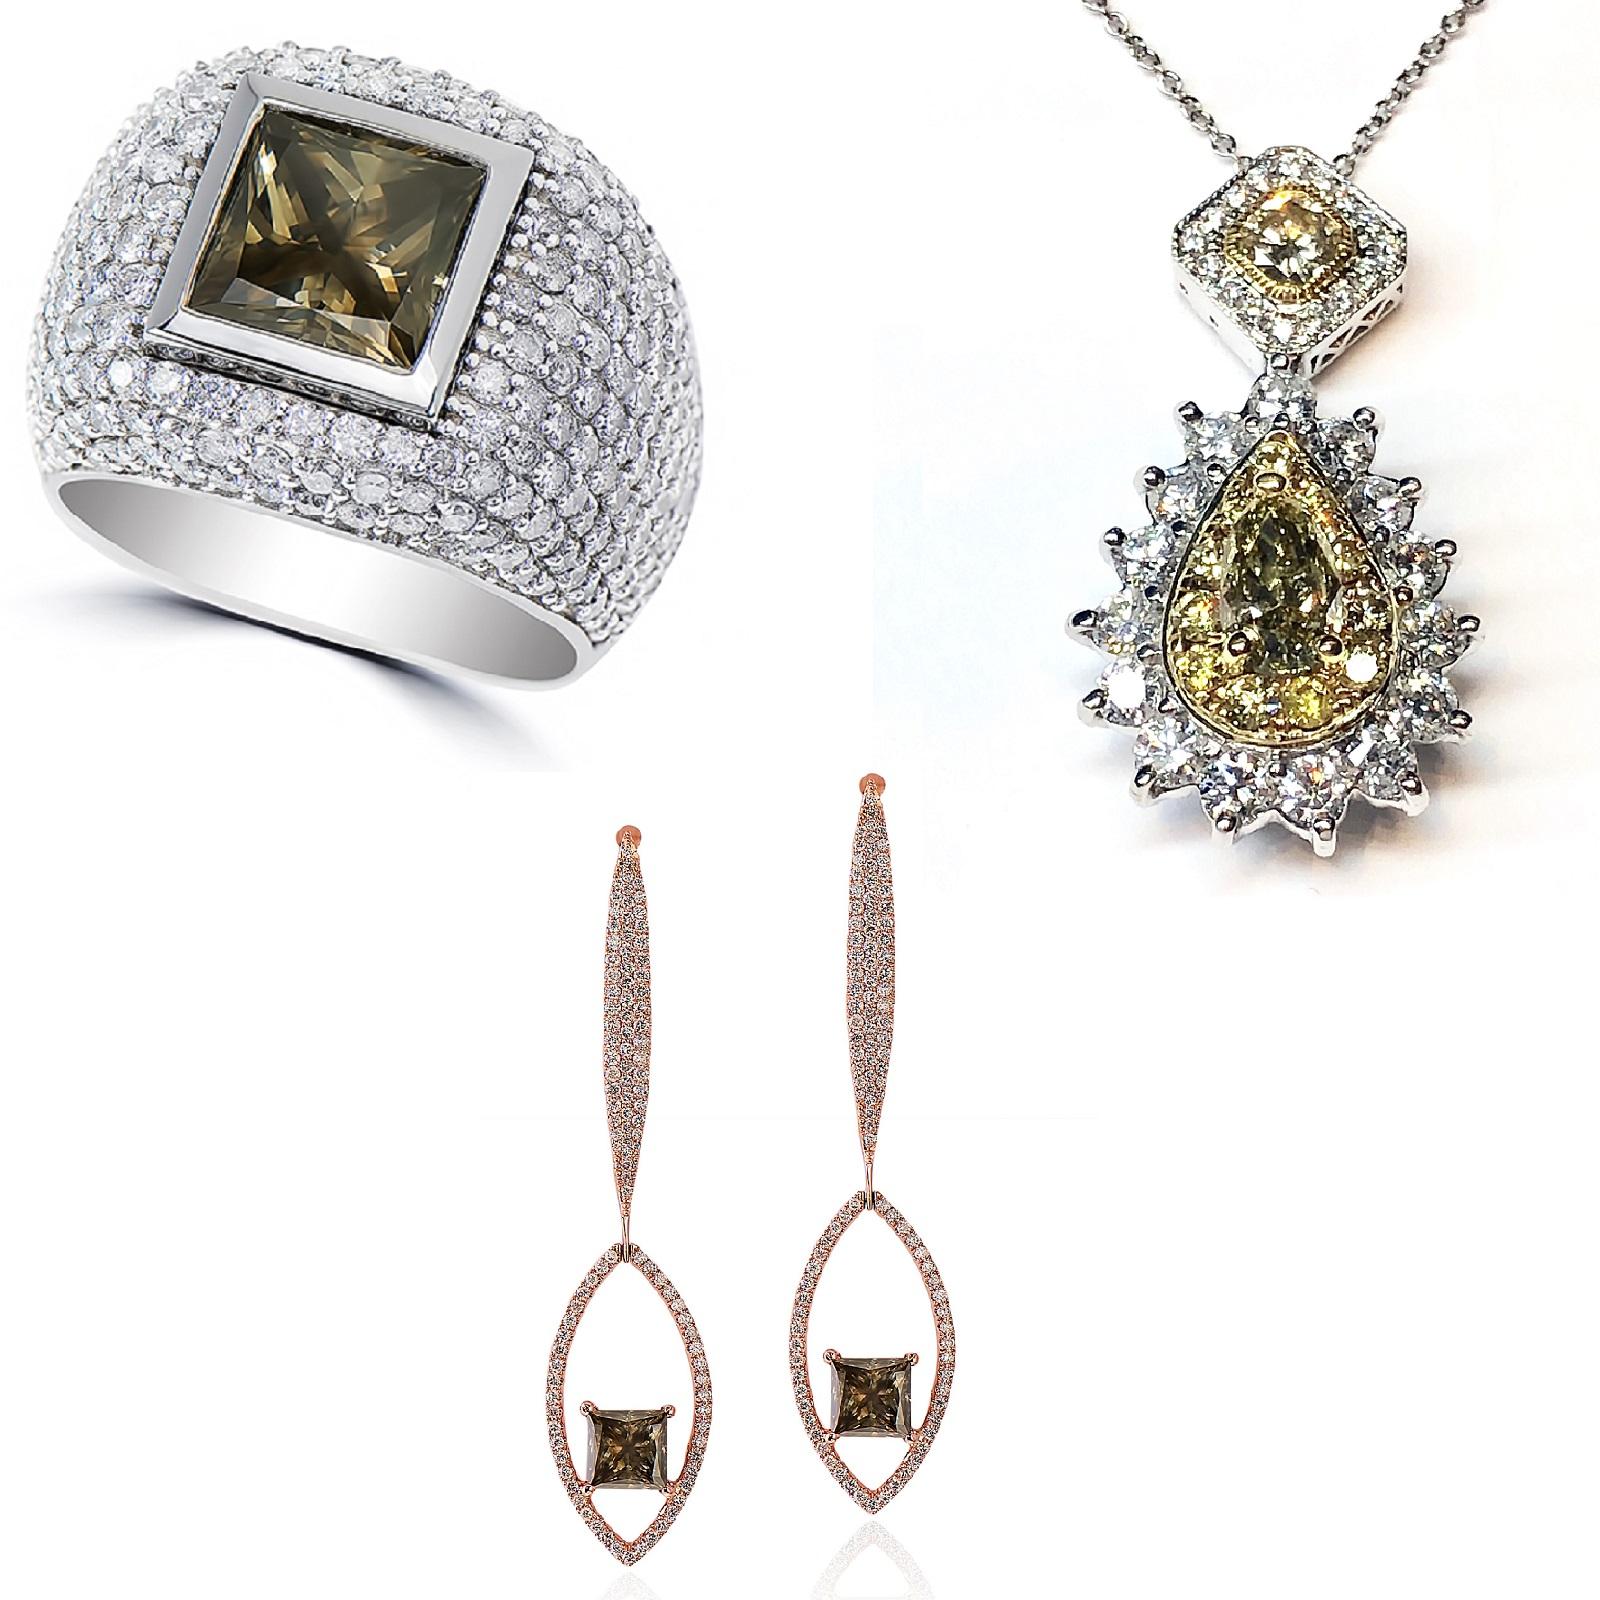 Mixed Brownish Green Diamonds Ring, Pendant & Earrings Set (14.96ct TW)